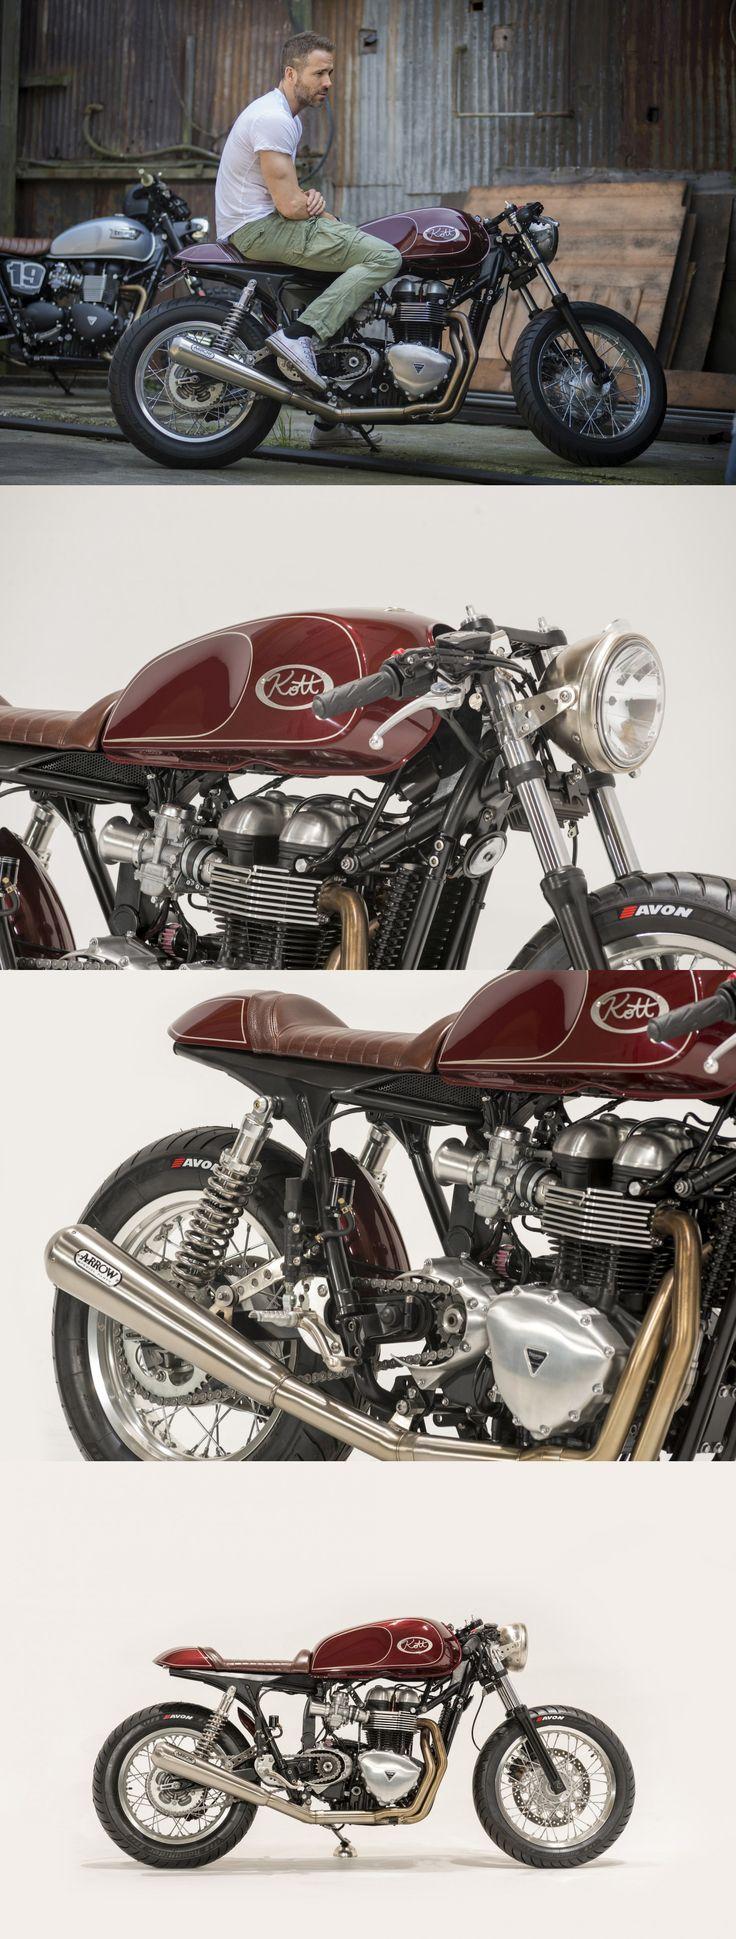 Ryan Reynolds Triumph Thruxton by Kott Motorcycles